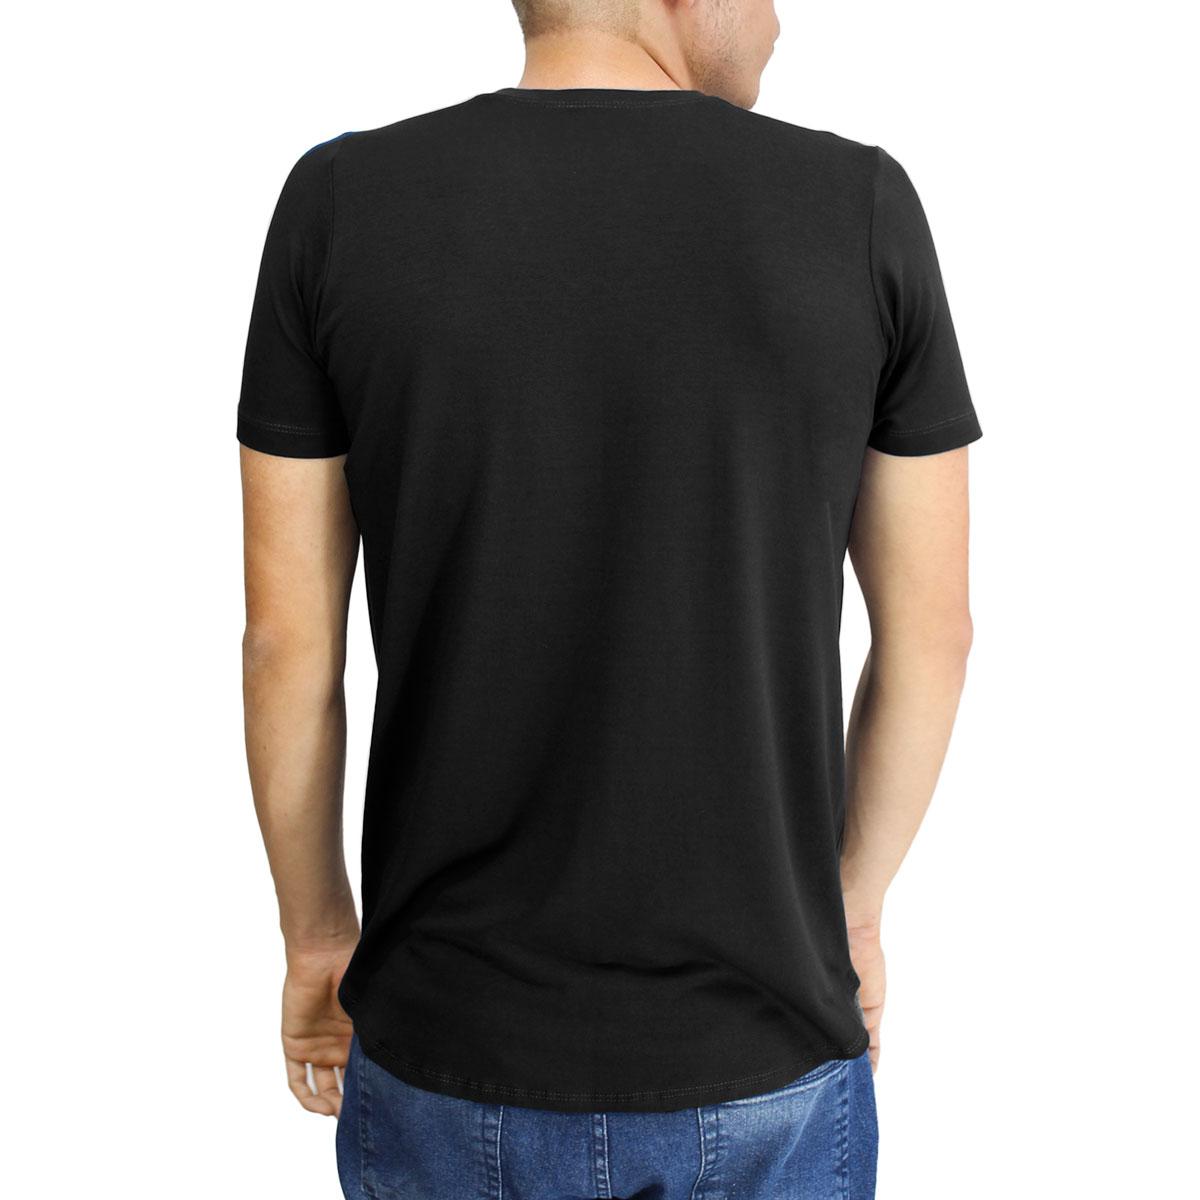 Camiseta Masculina Gola V Manga Curta Lynnce